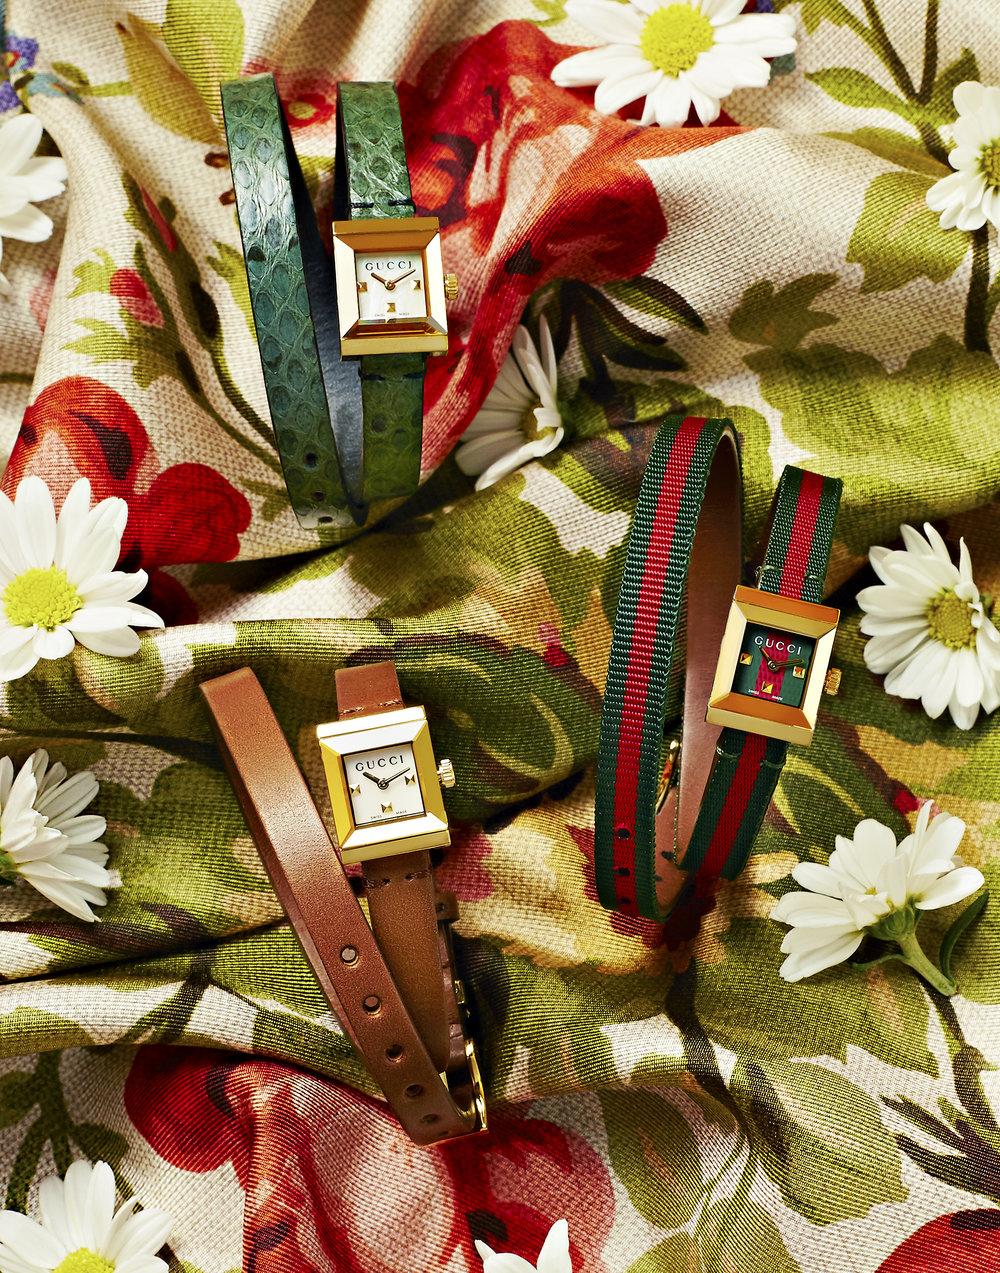 14_Gucci_Flowers_3.jpg